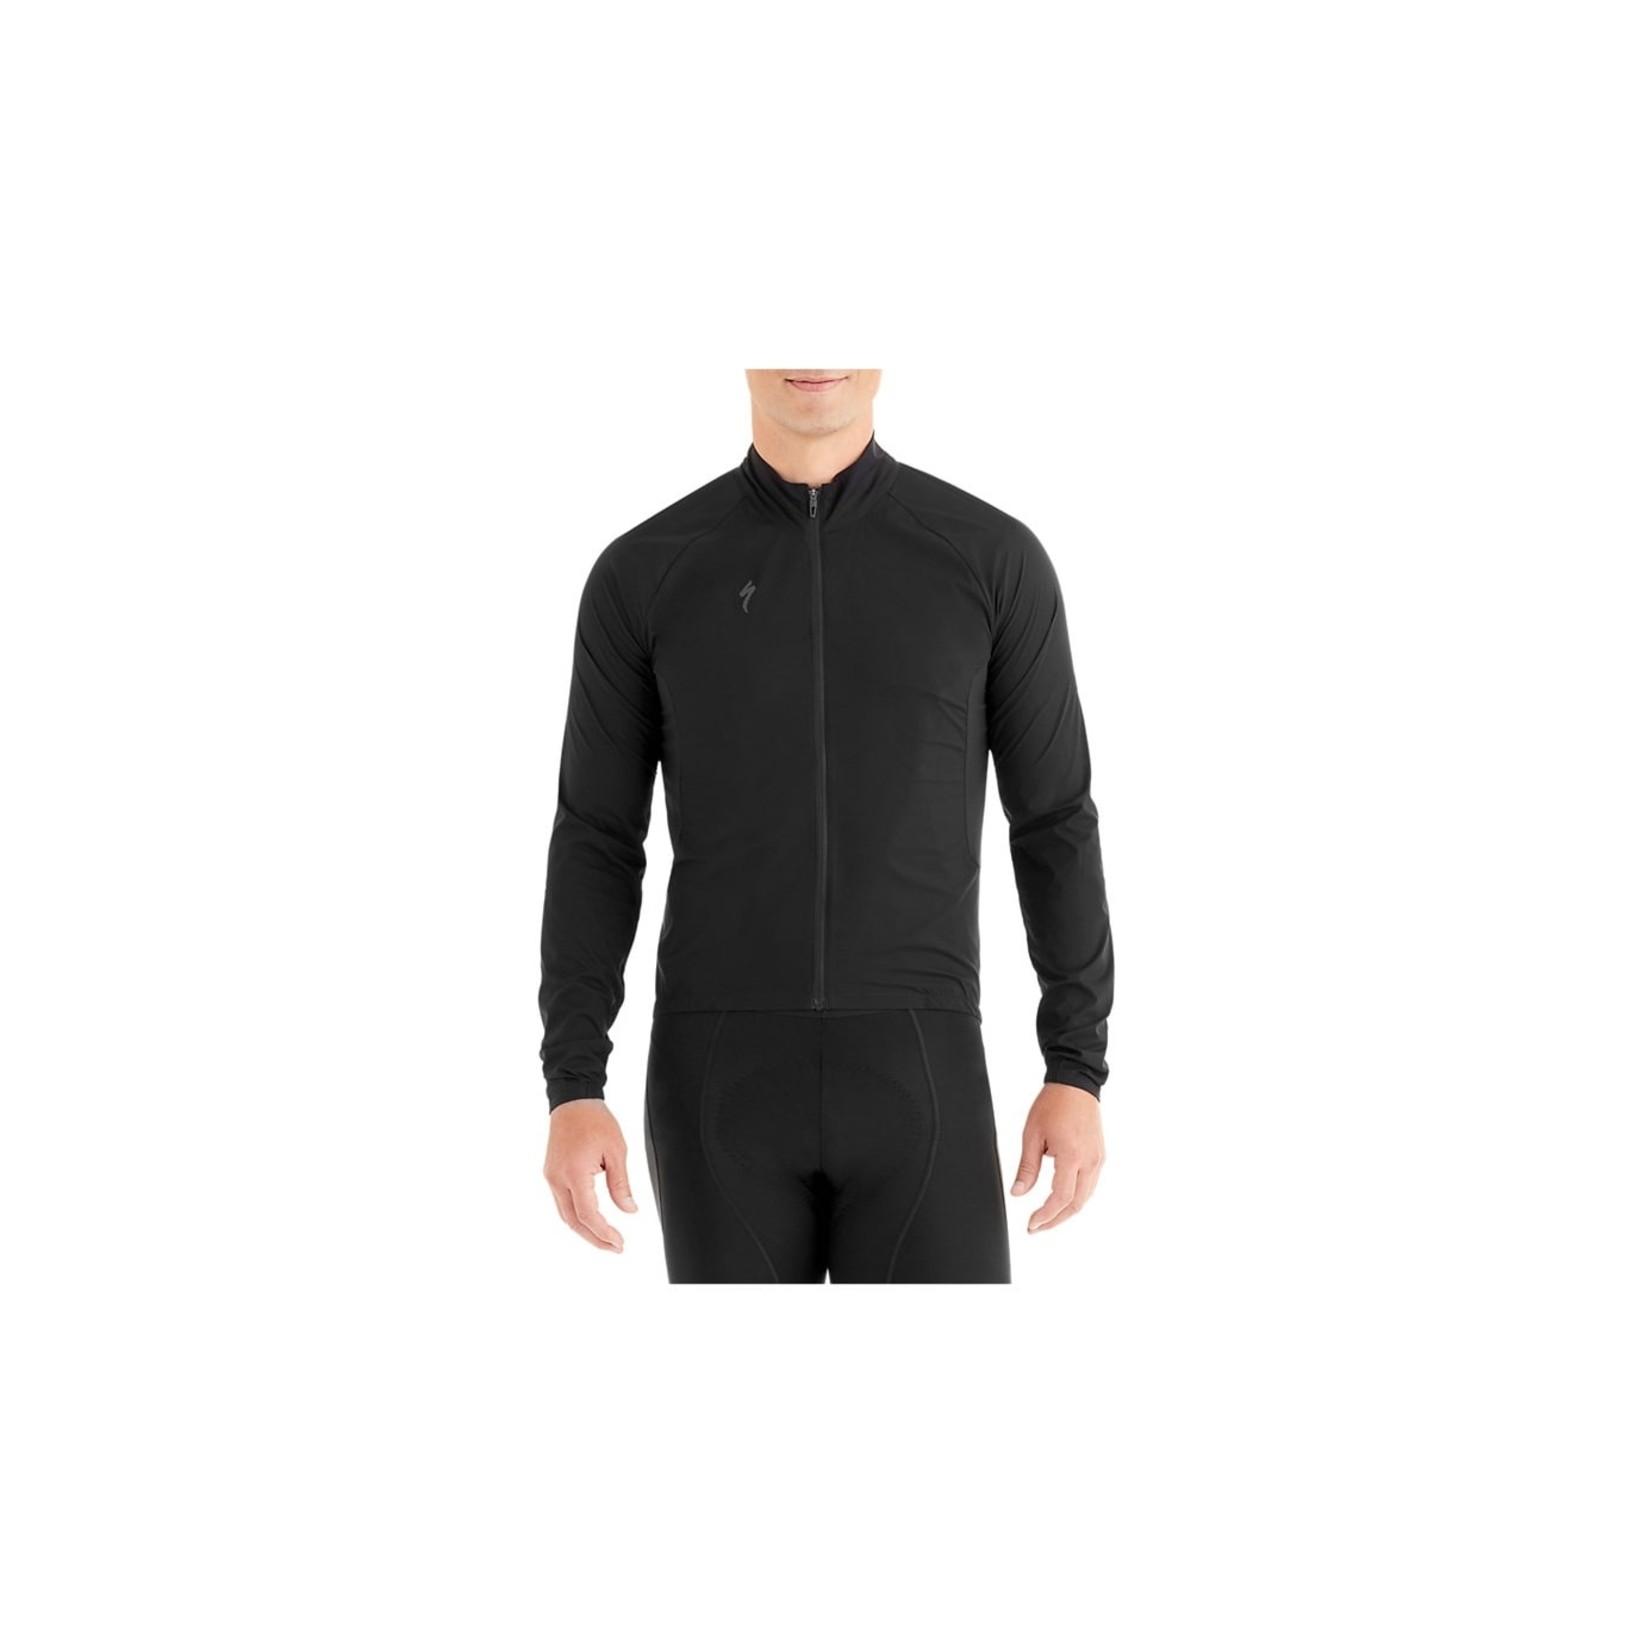 Specialized Specialized Men's Deflect Wind Jacket